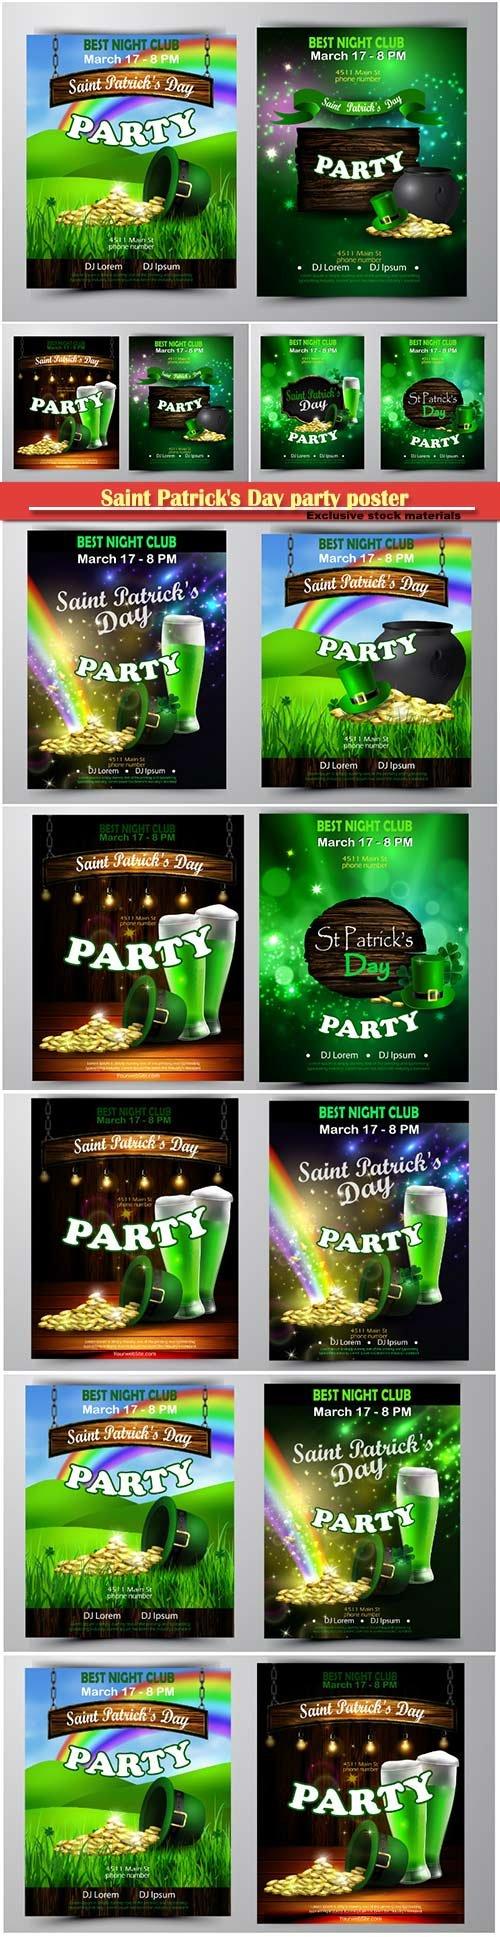 Irish holiday Saint Patrick s Day party poster